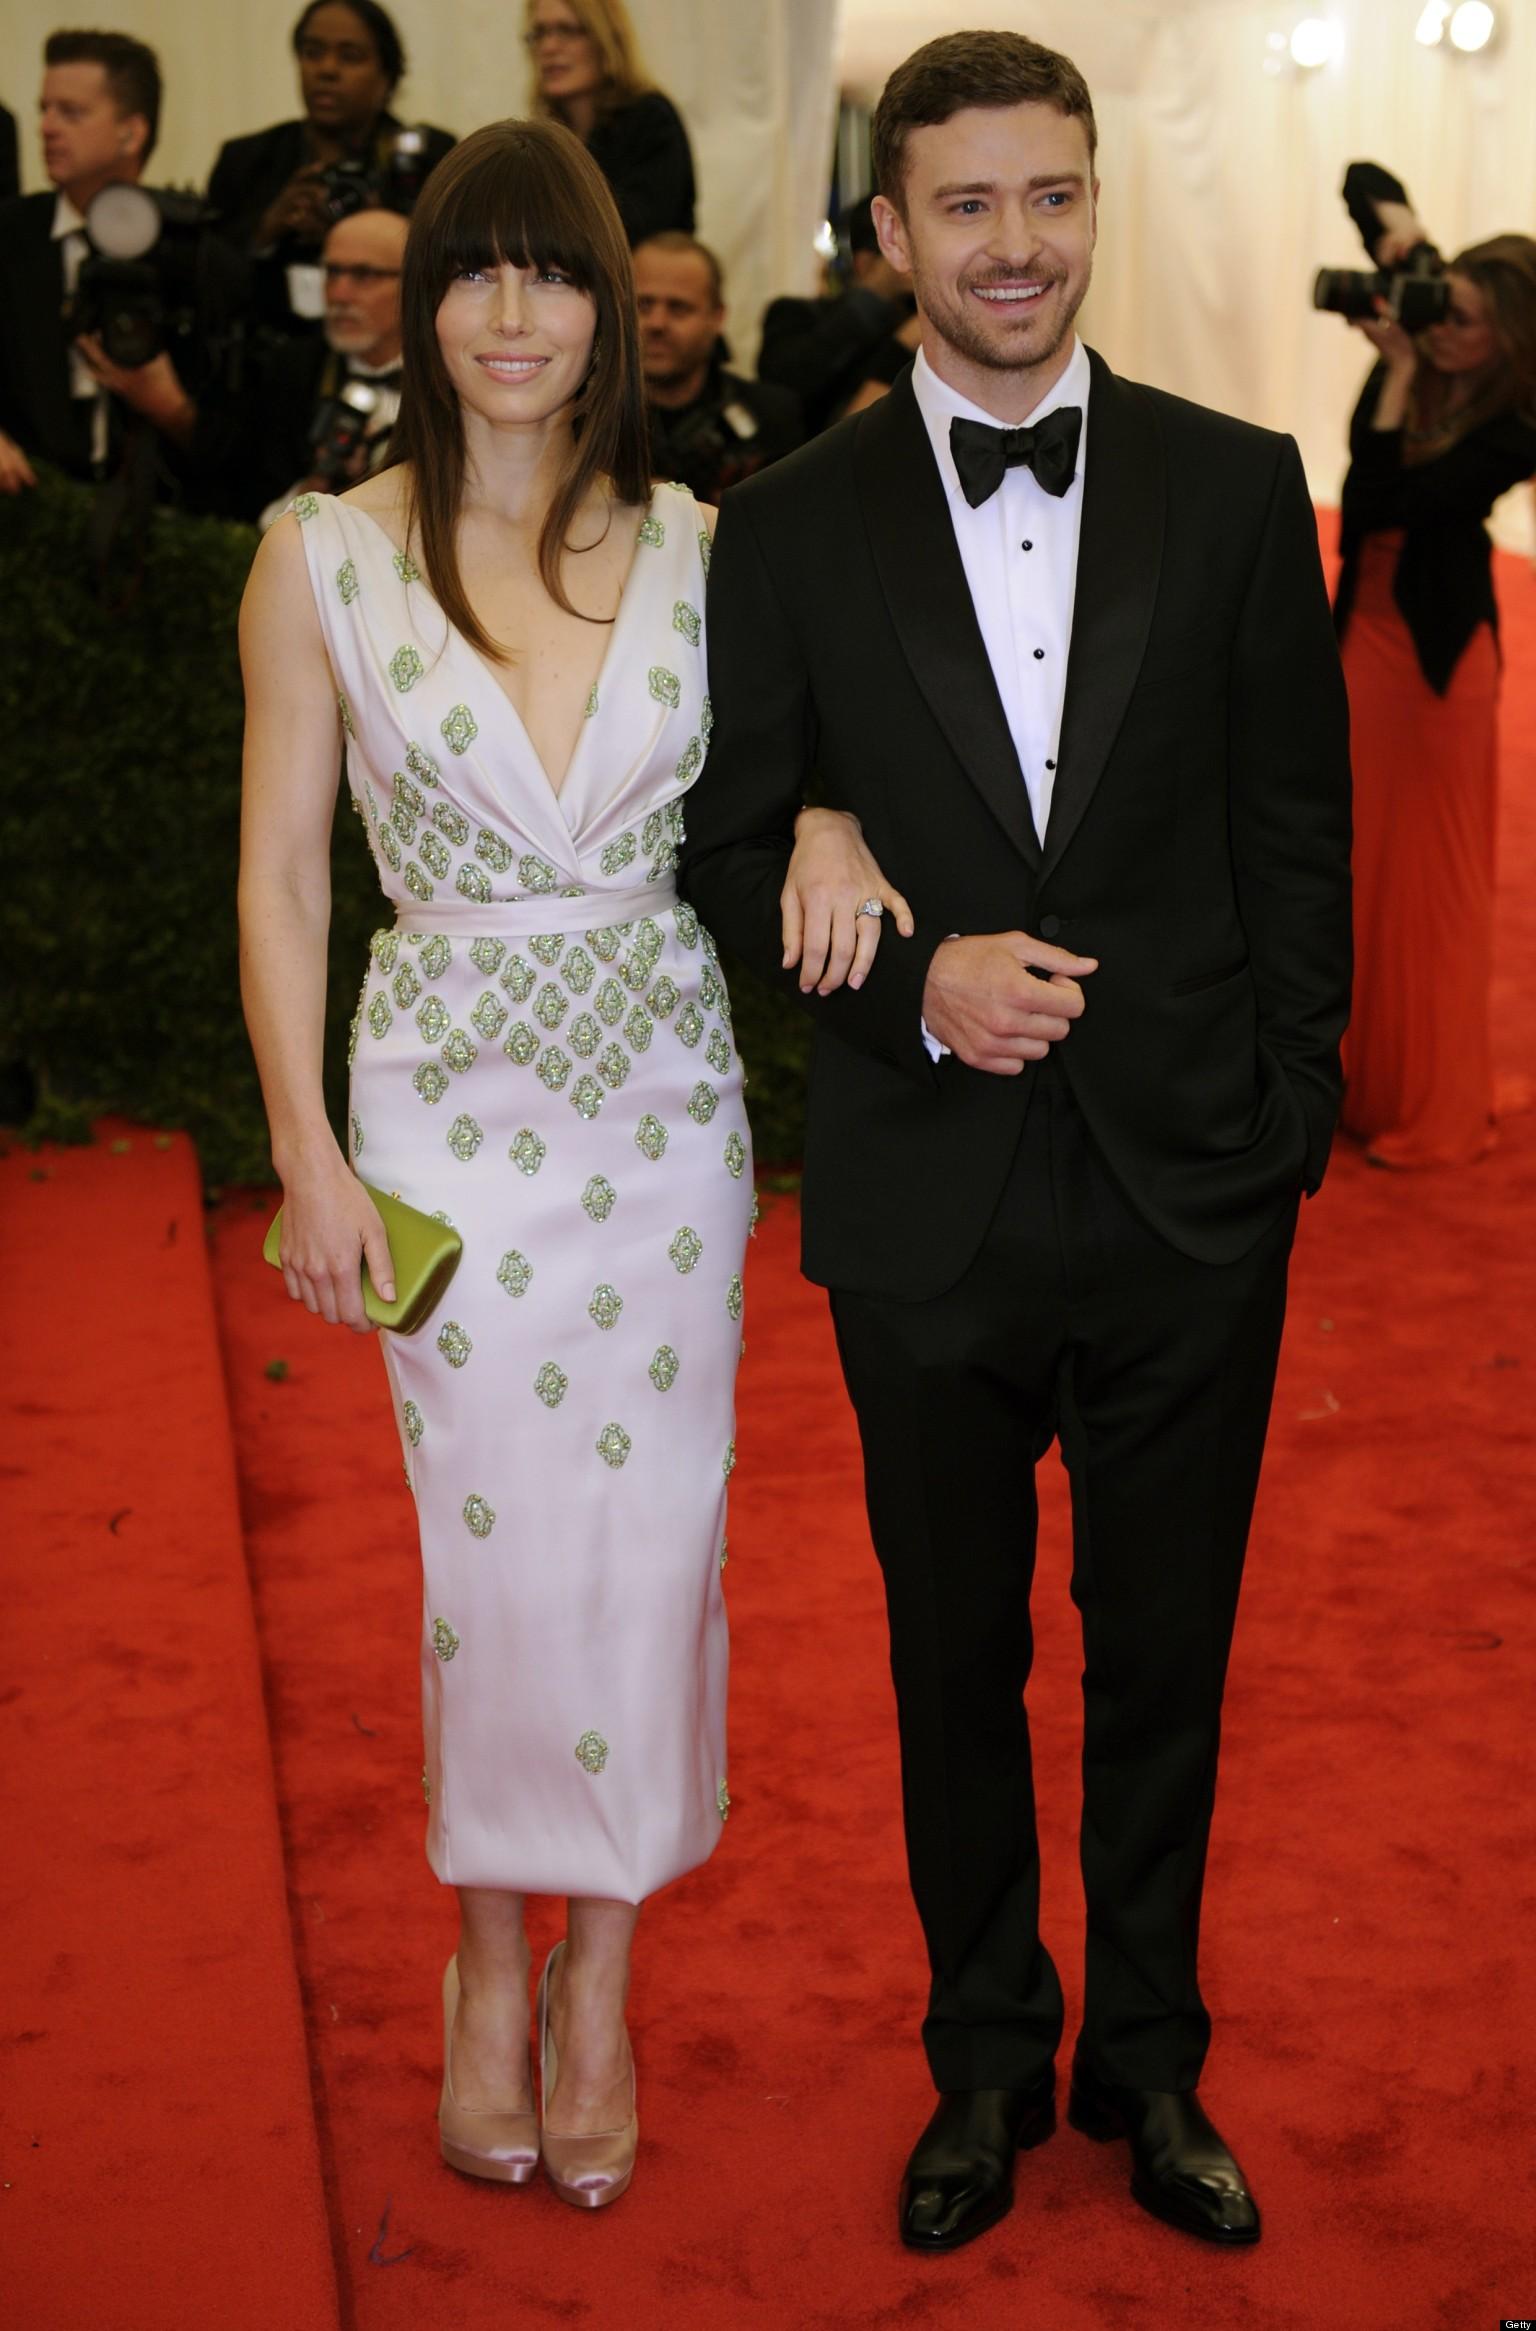 Justin Timberlake Jessica Biel Wedding Photos Sold To People Magazine Huffpost